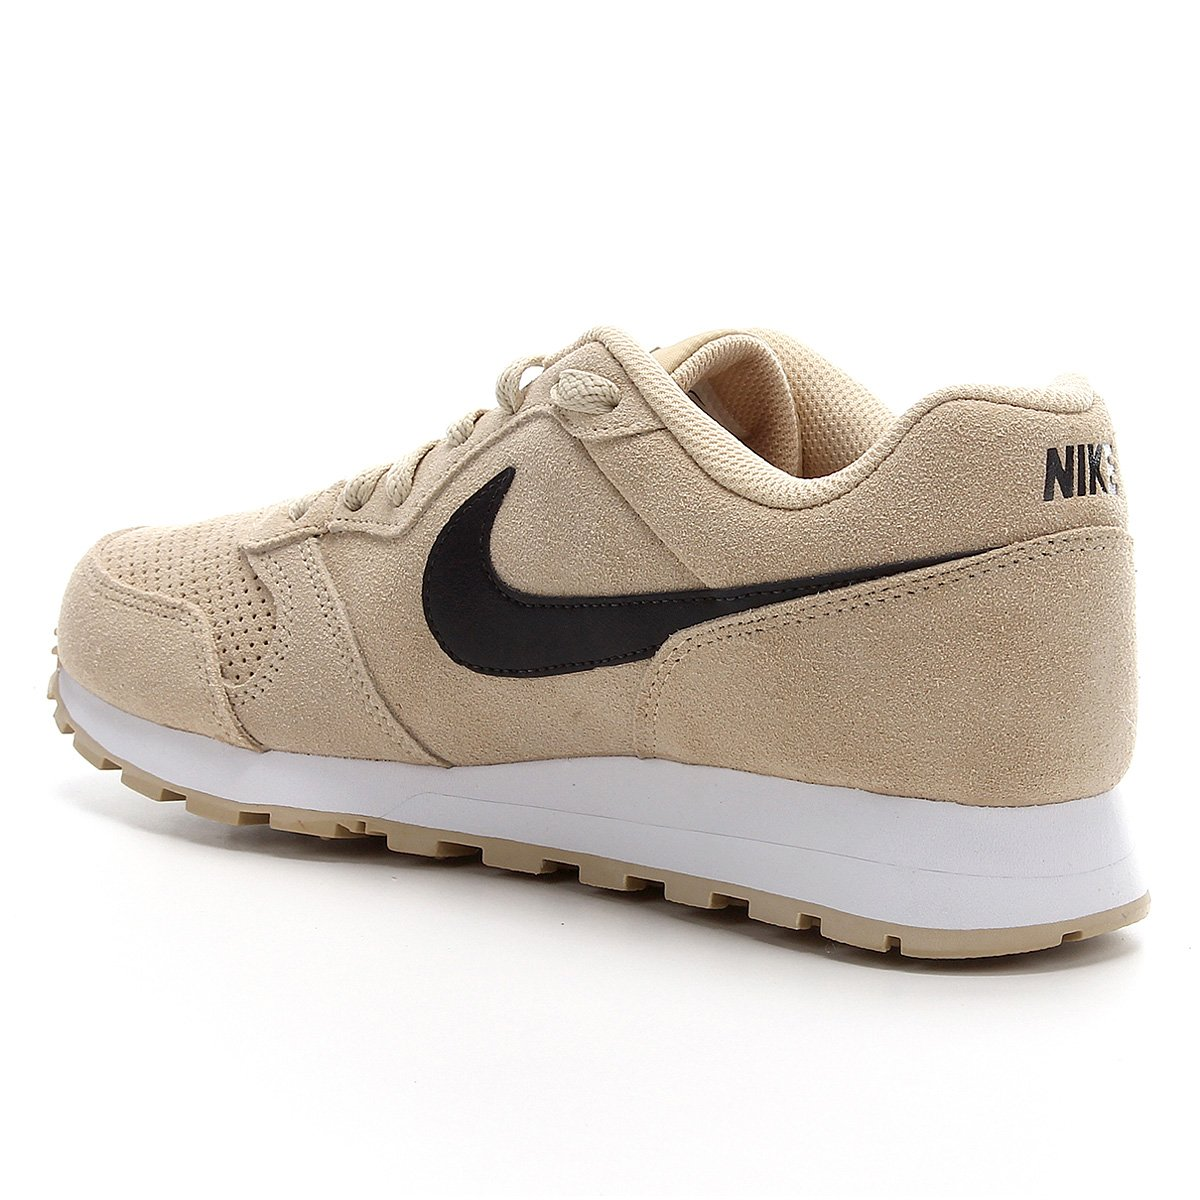 Tênis Nike Md Runner 2 Suede Masculino - Tam: 43 - 1